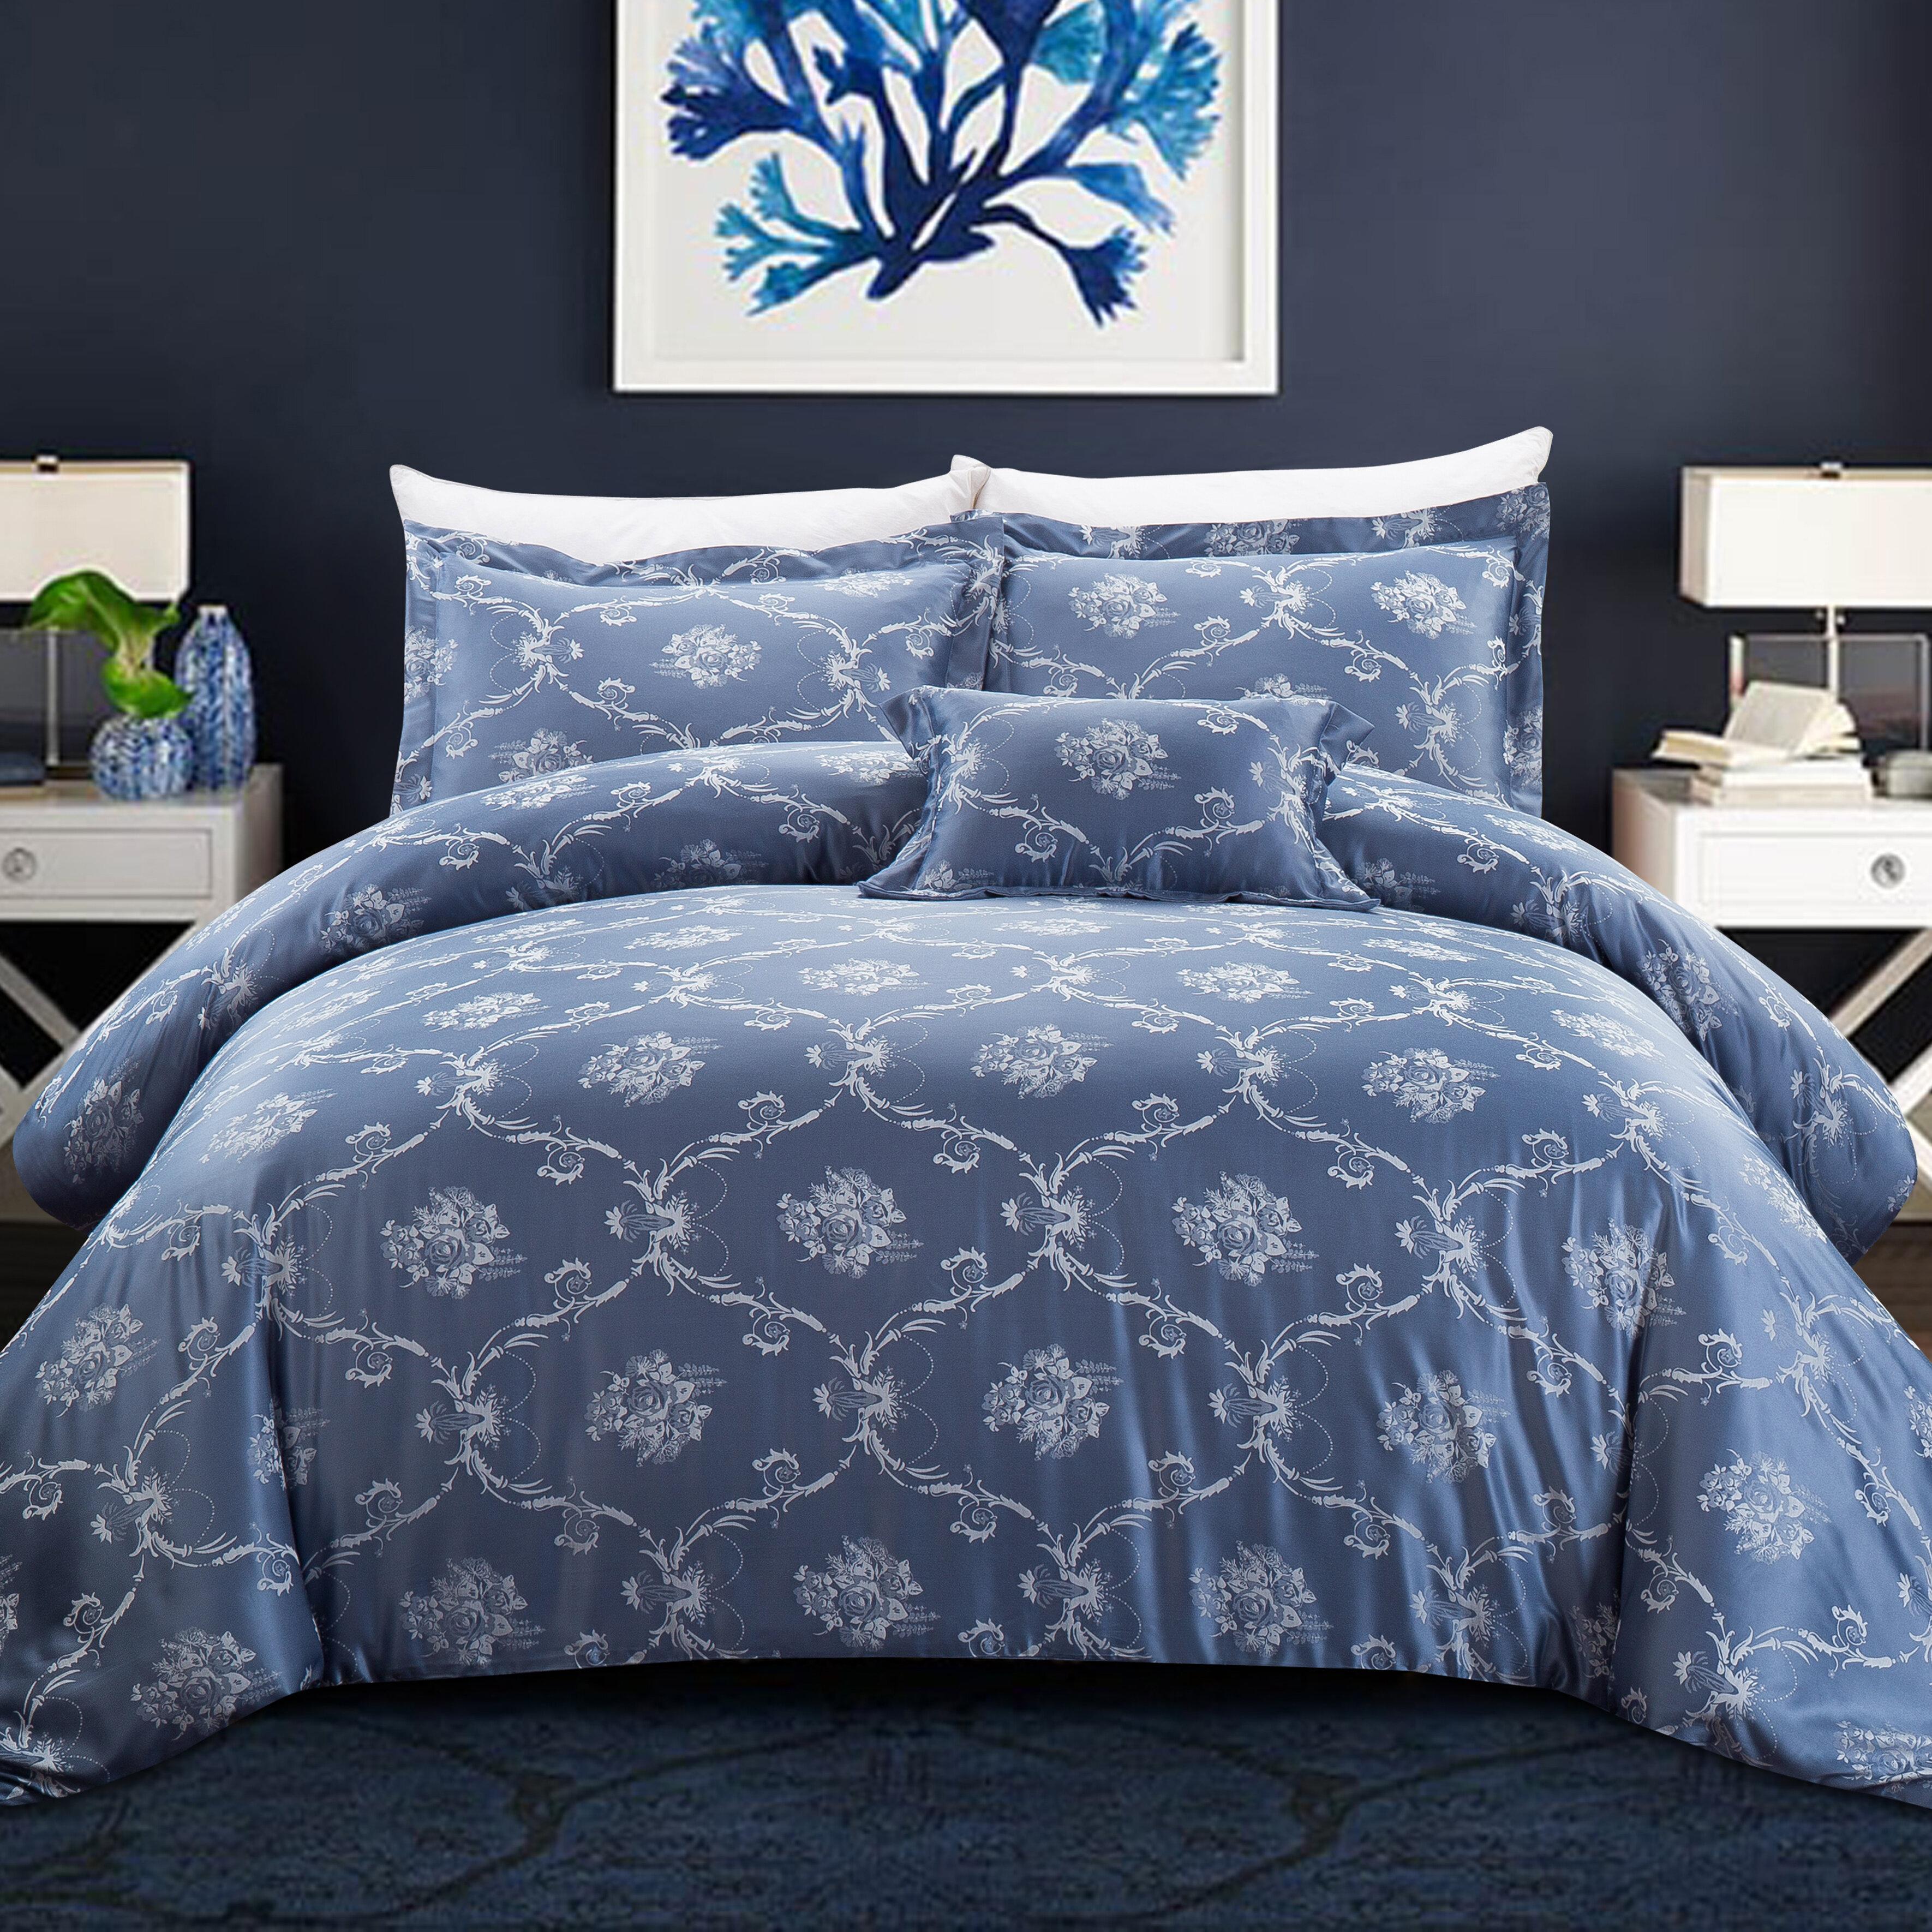 NEW Grandeur Swirls Reversible Printed Bedding Duvet Quilt Set All Sizes